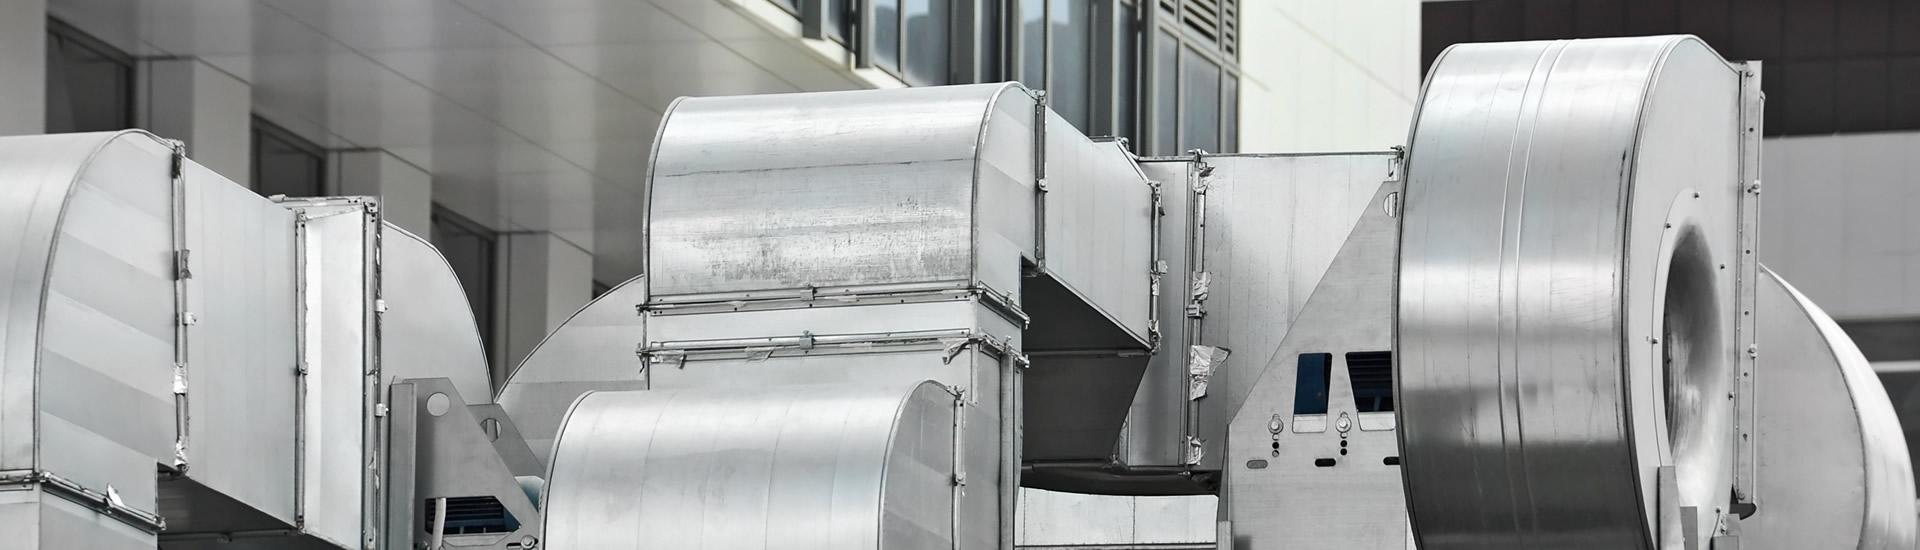 Innovative mechanical systems commercial hvac contractor for Innovative hvac systems